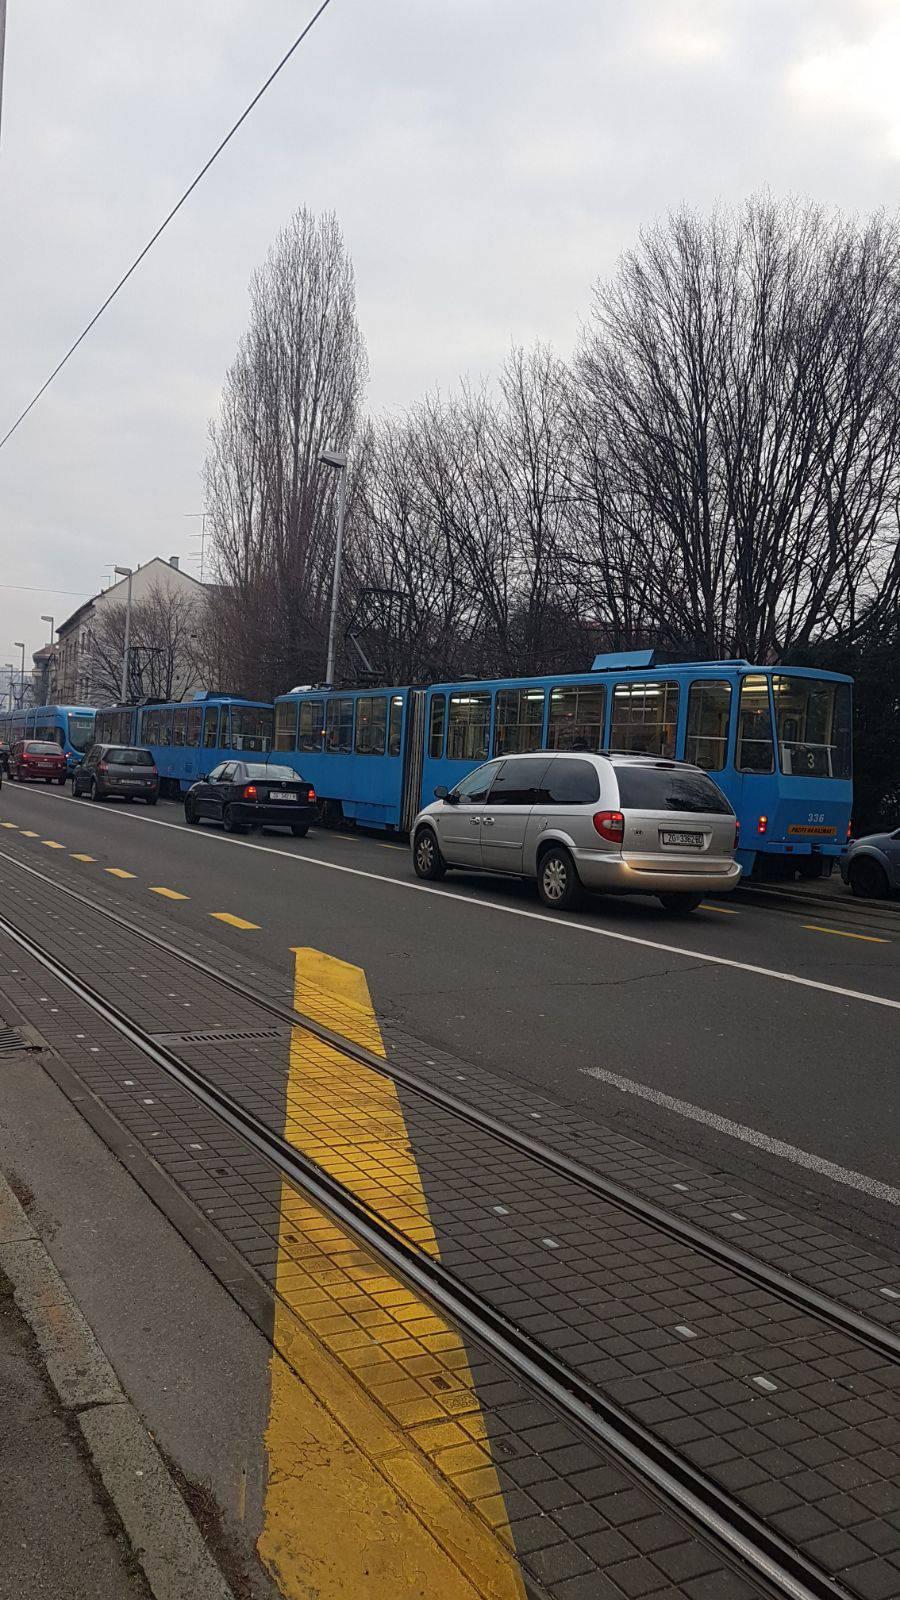 Kaos u Zagrebu: Sudar auta i tramvaja, nastale velike gužve